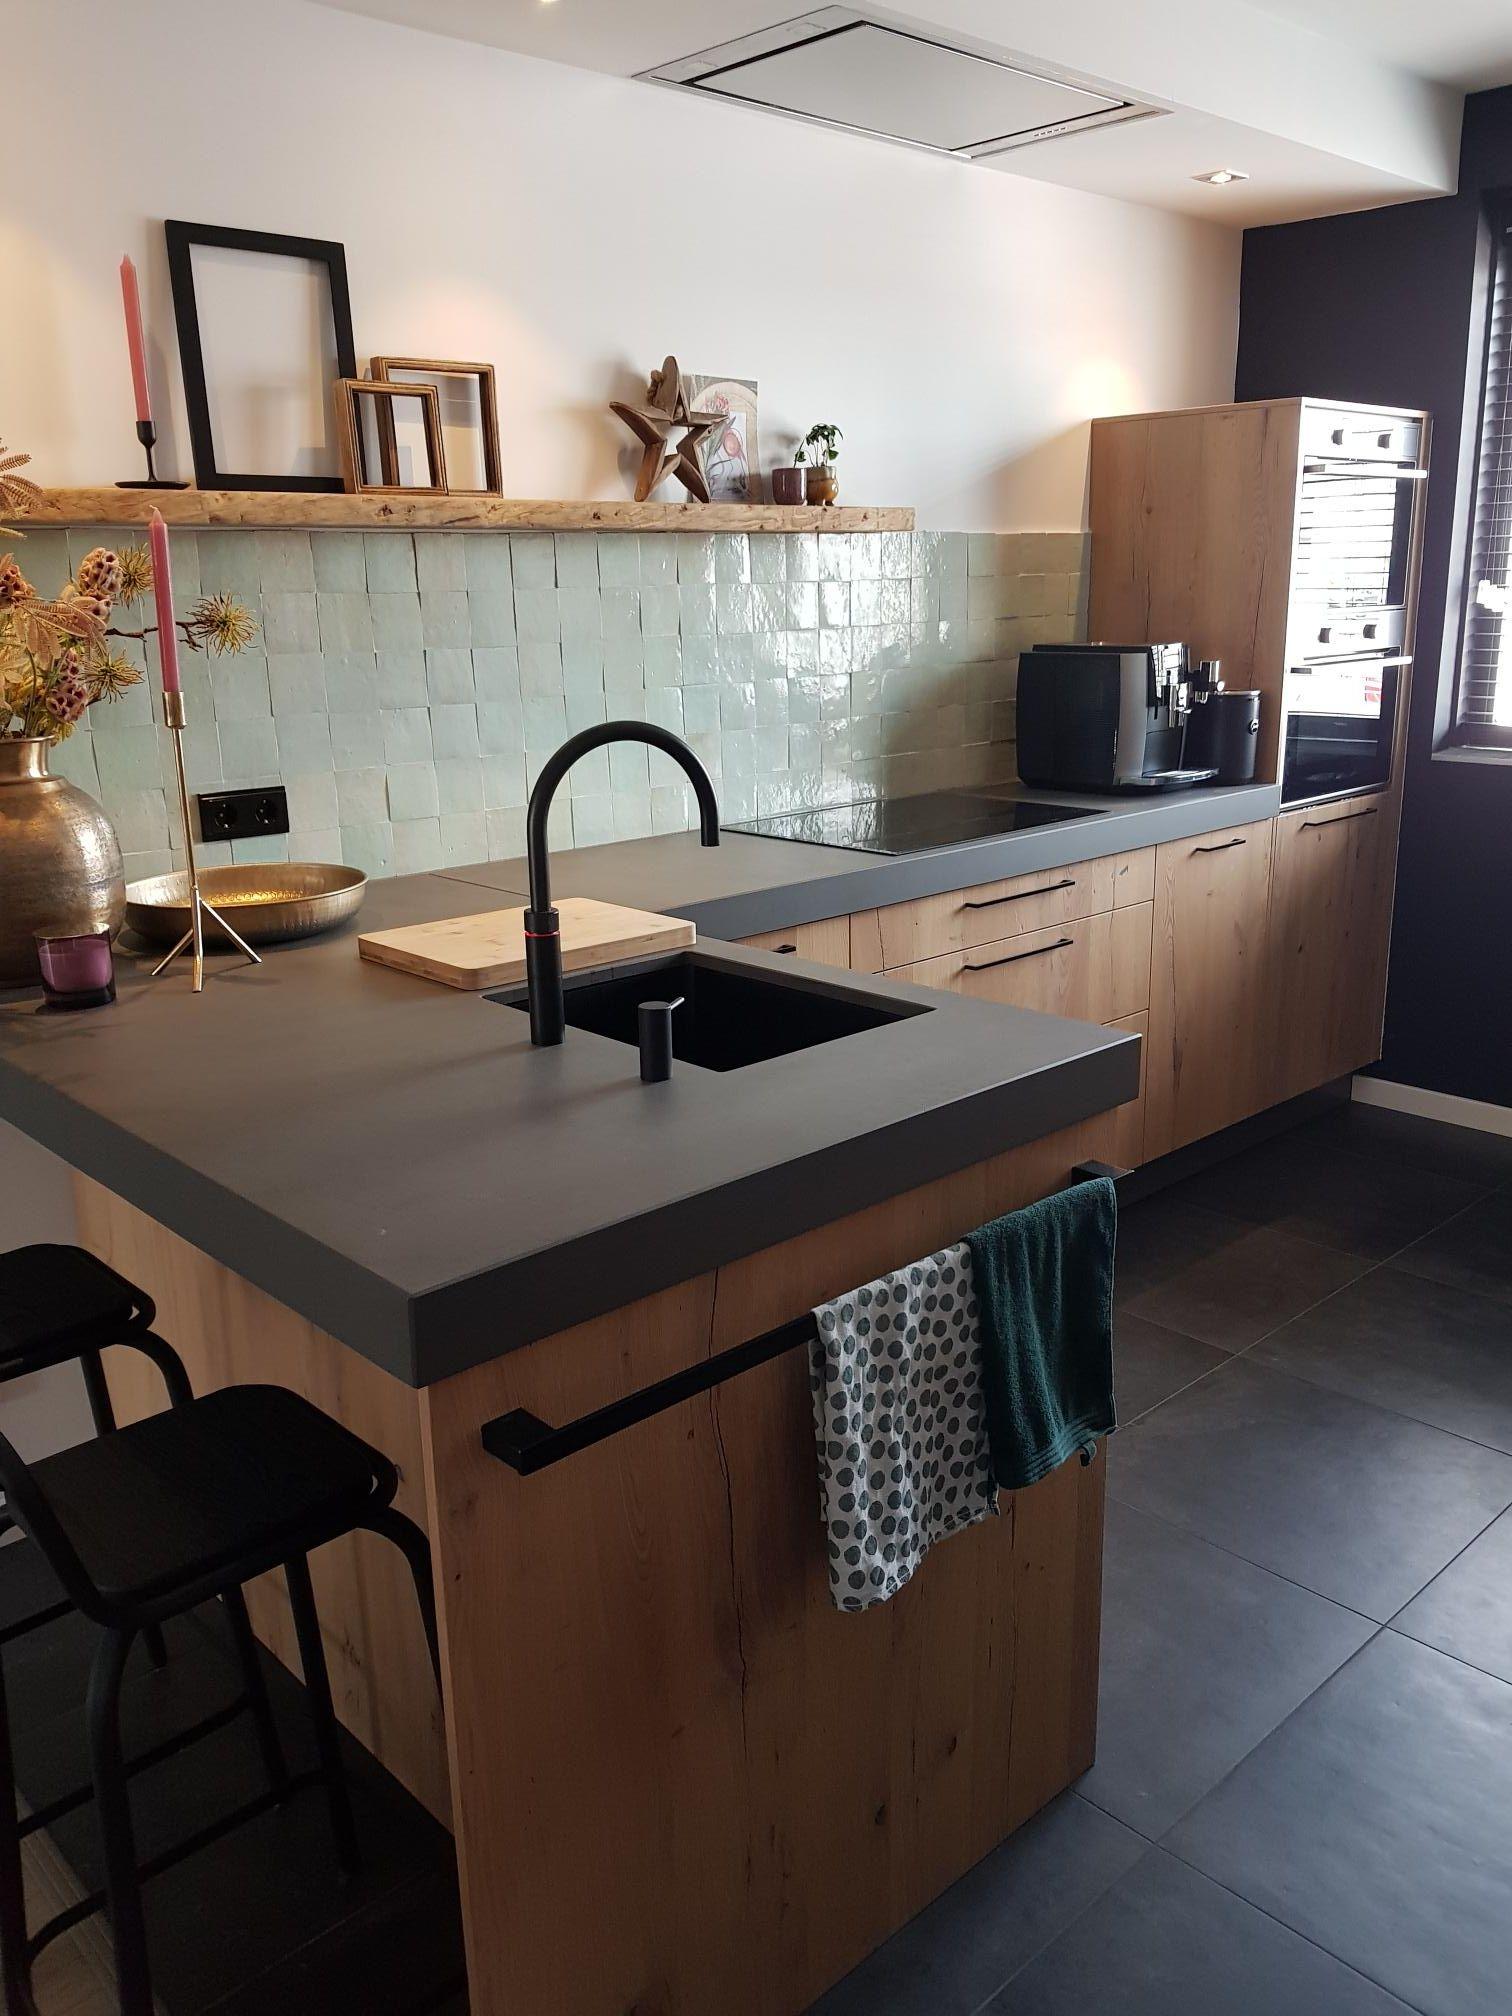 I Like The Counters In 2020 Wohnung Kuche Haus Kuchen Innenarchitektur Kuche